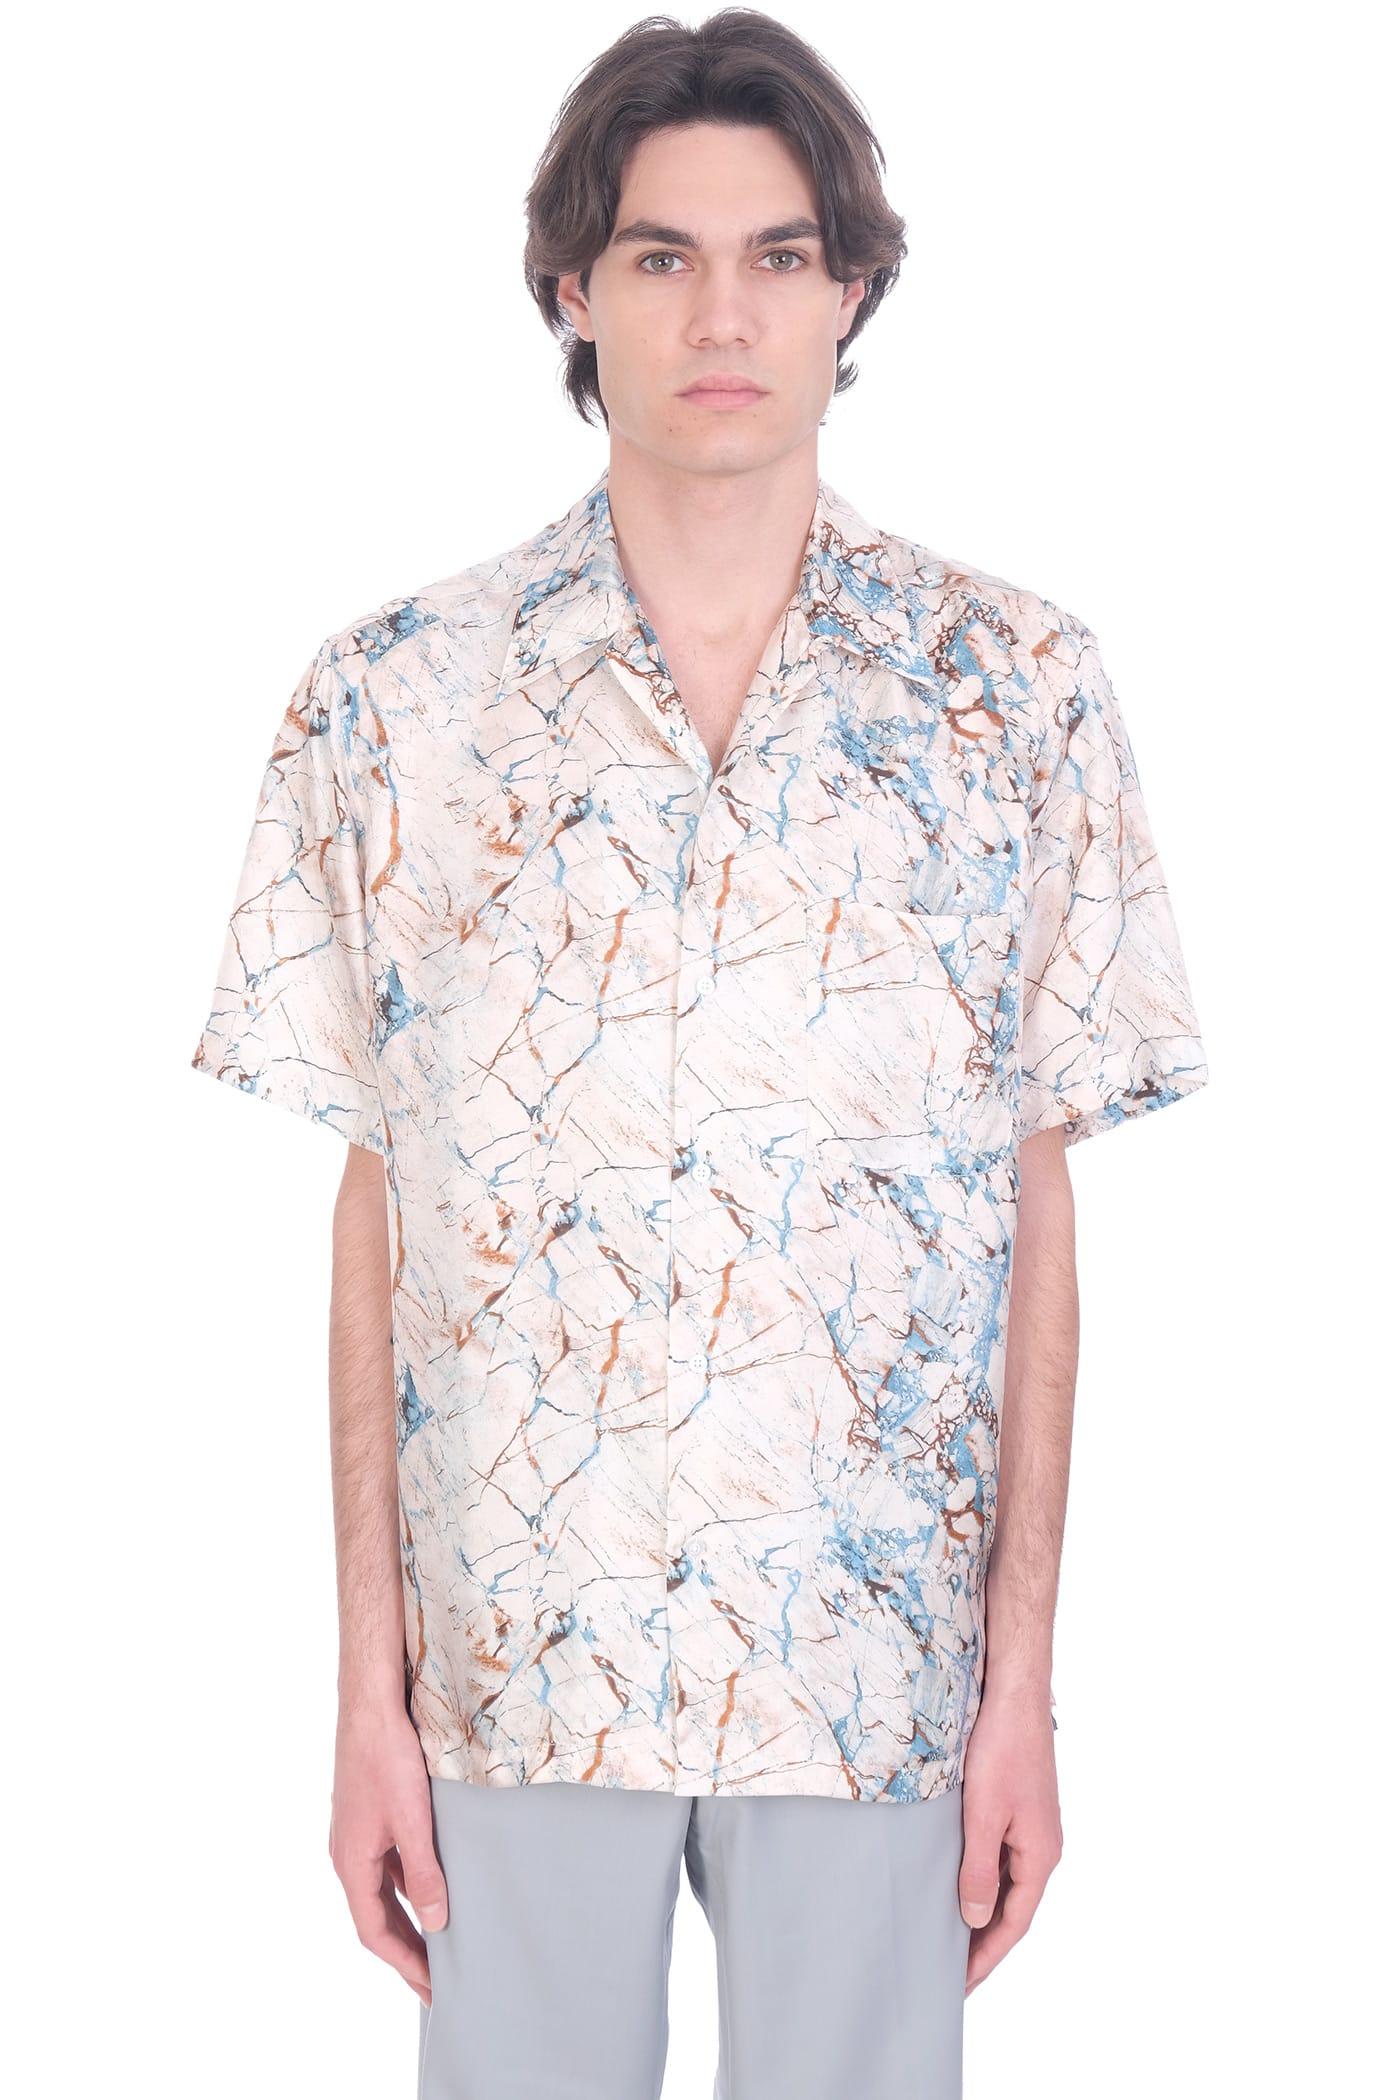 Erzin Shirt In Powder Silk